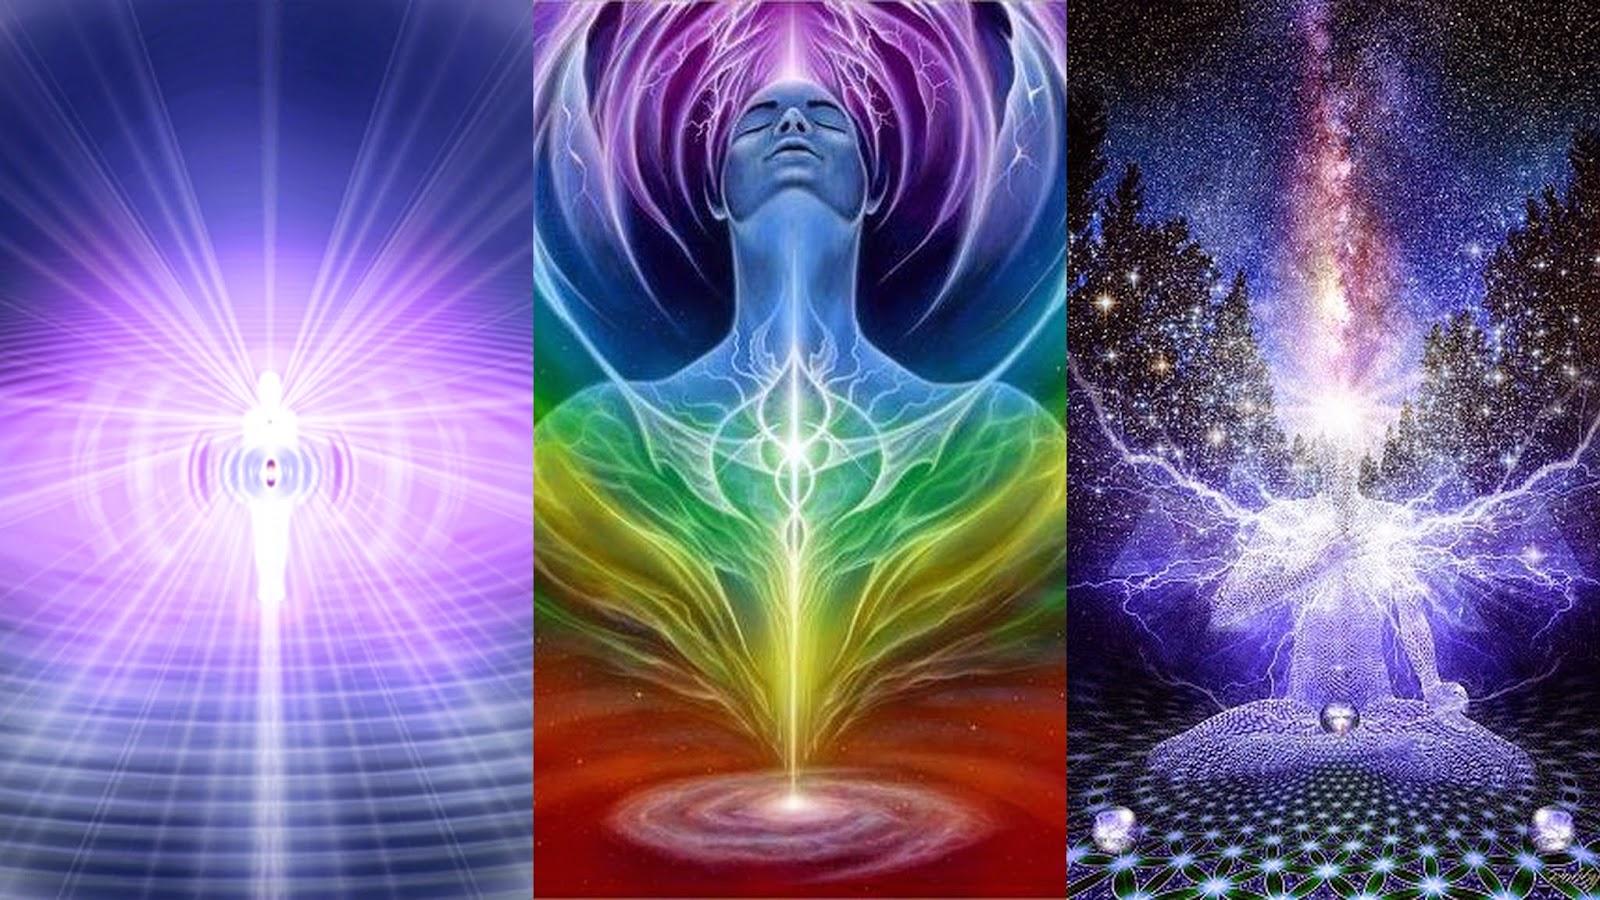 Life is celebration - Meditation art wallpaper ...